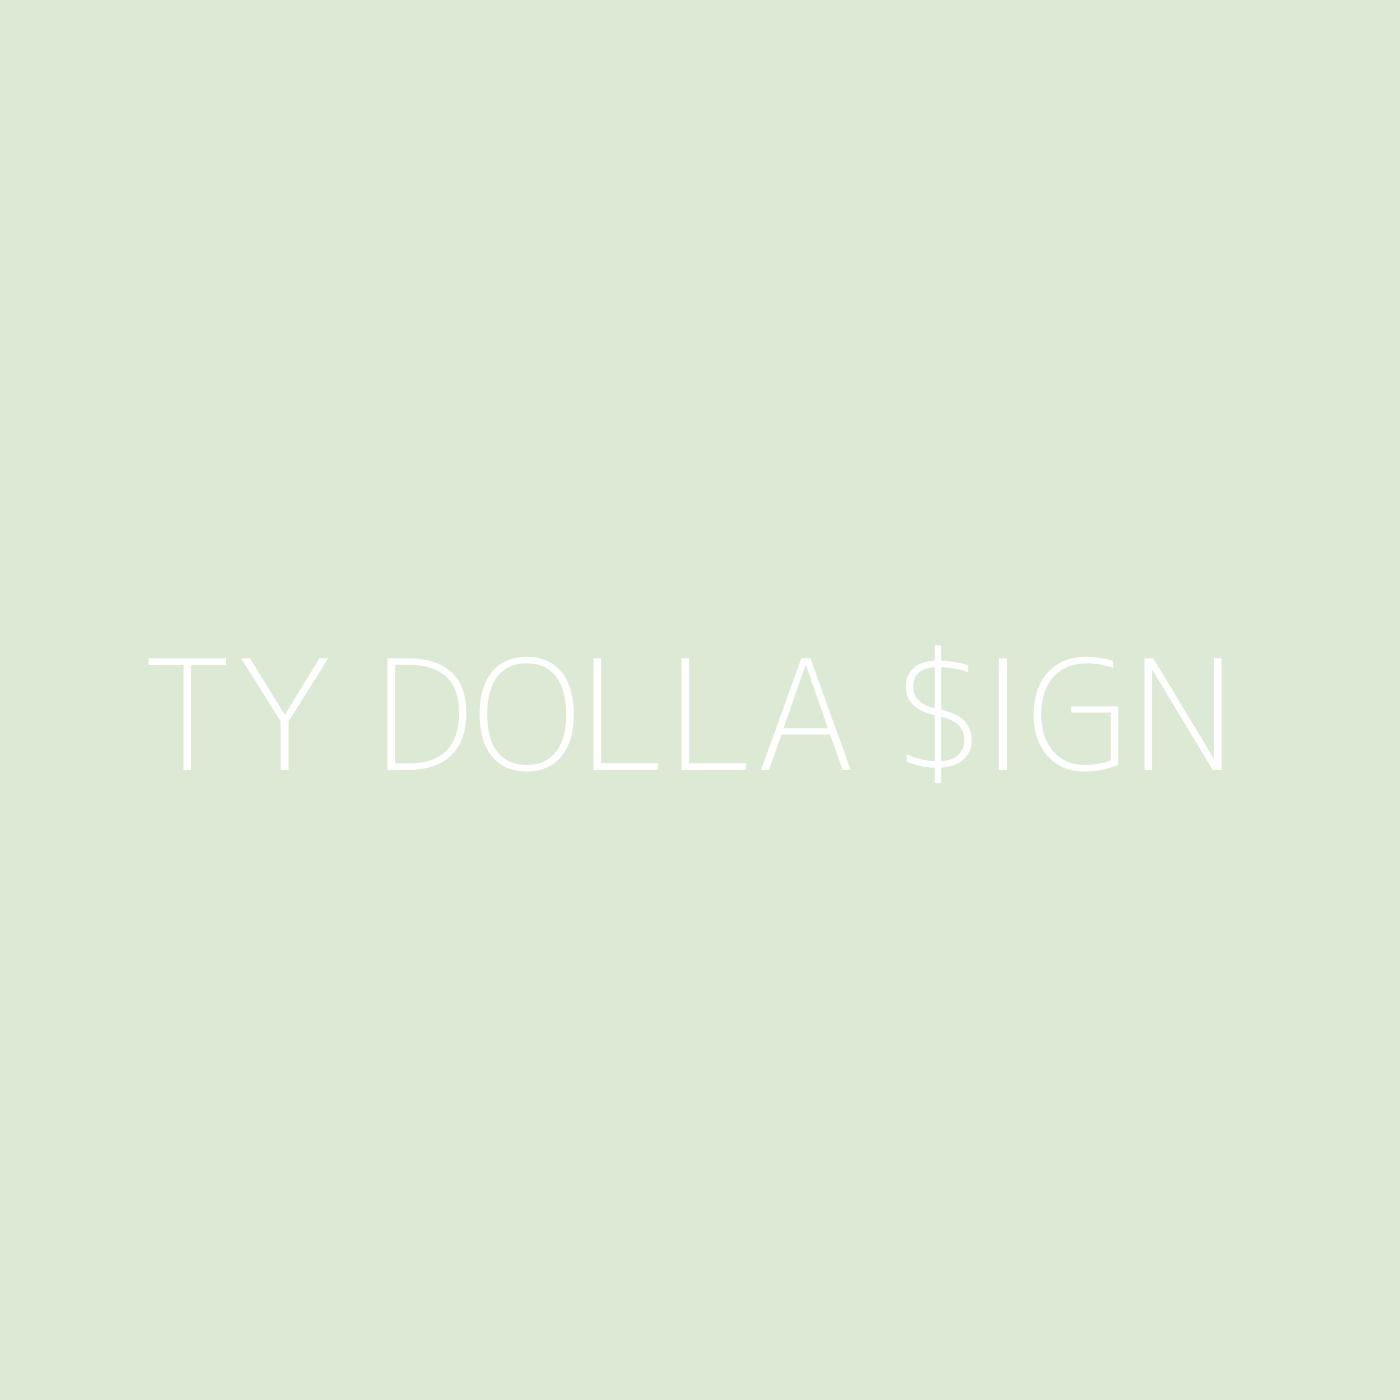 Ty Dolla $ign Playlist Artwork